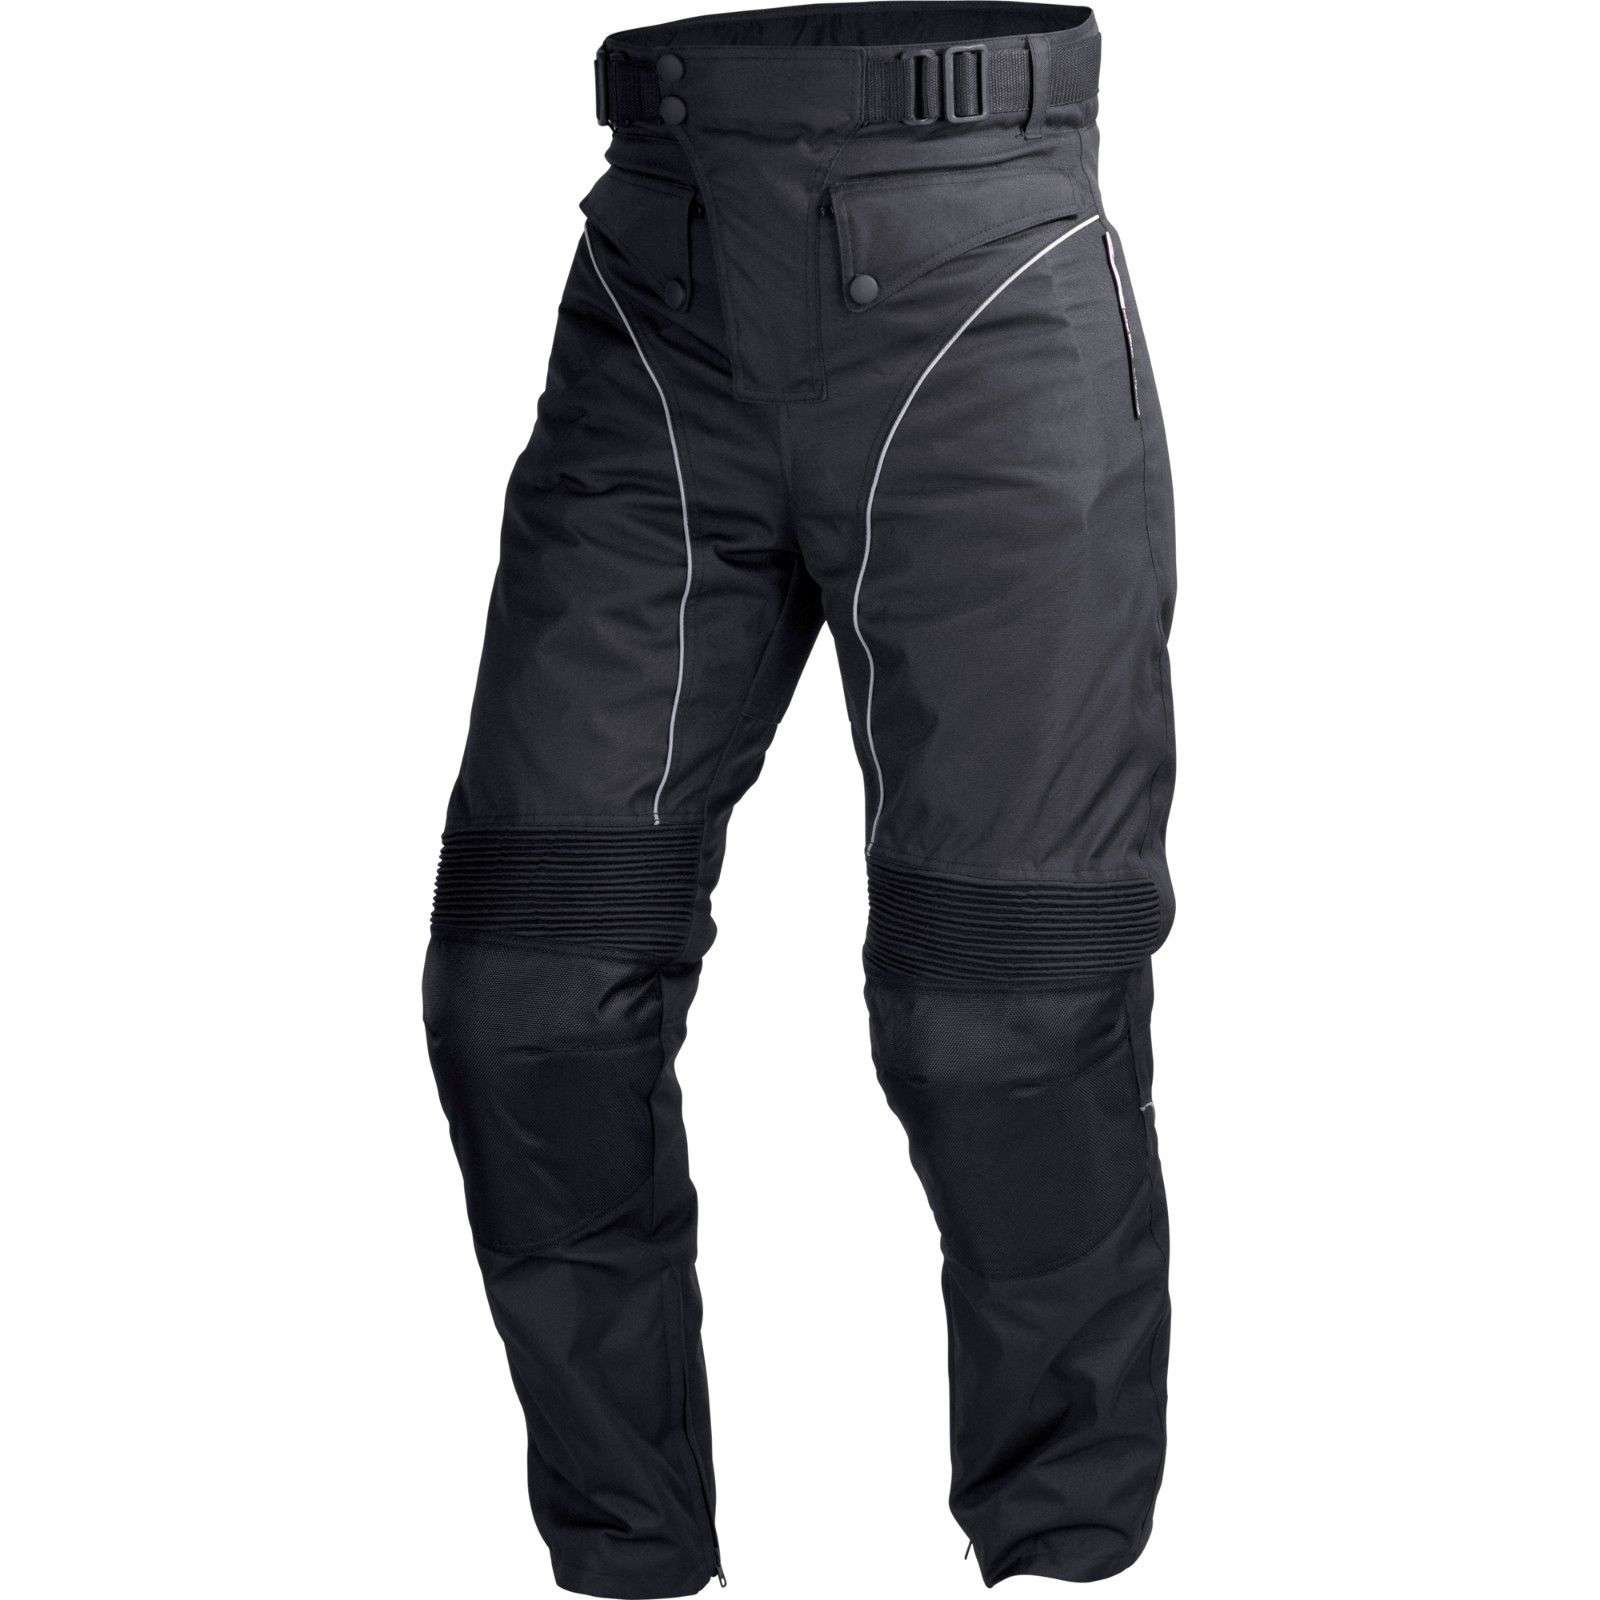 Anchorage-Mens-Textile-Motorcycle-Waterproof-Pants